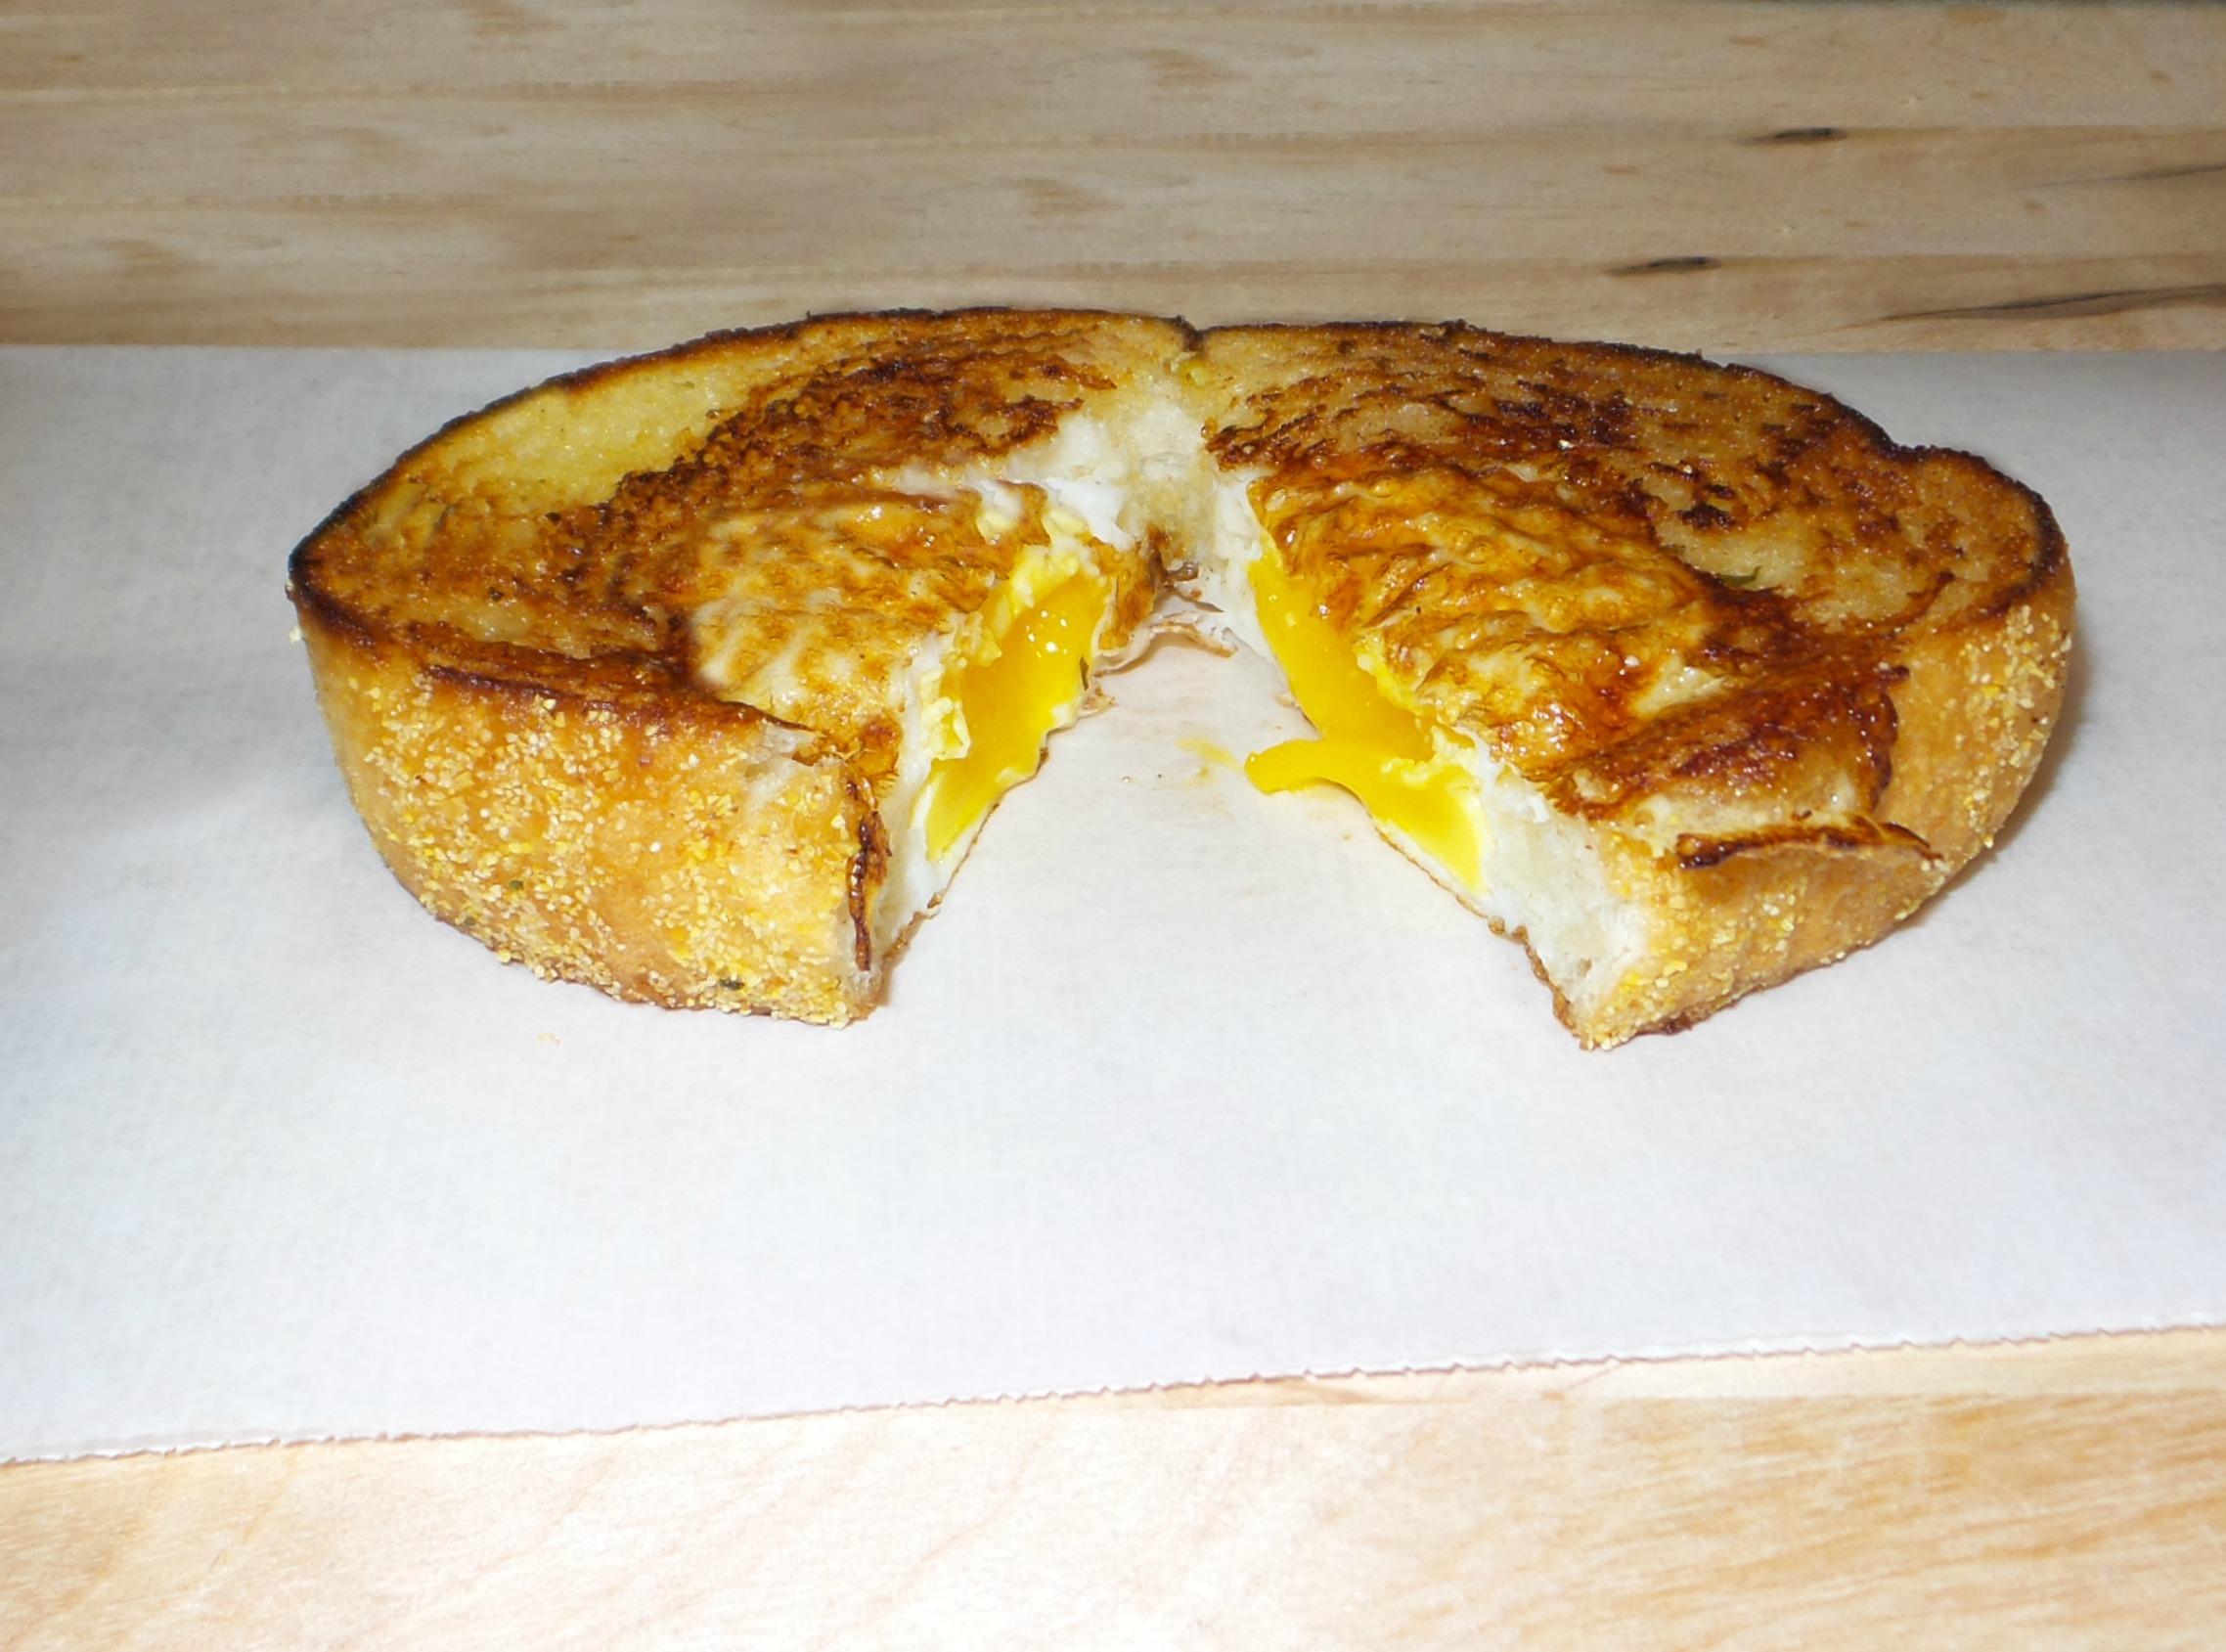 garlic bread eggs in a nest final version